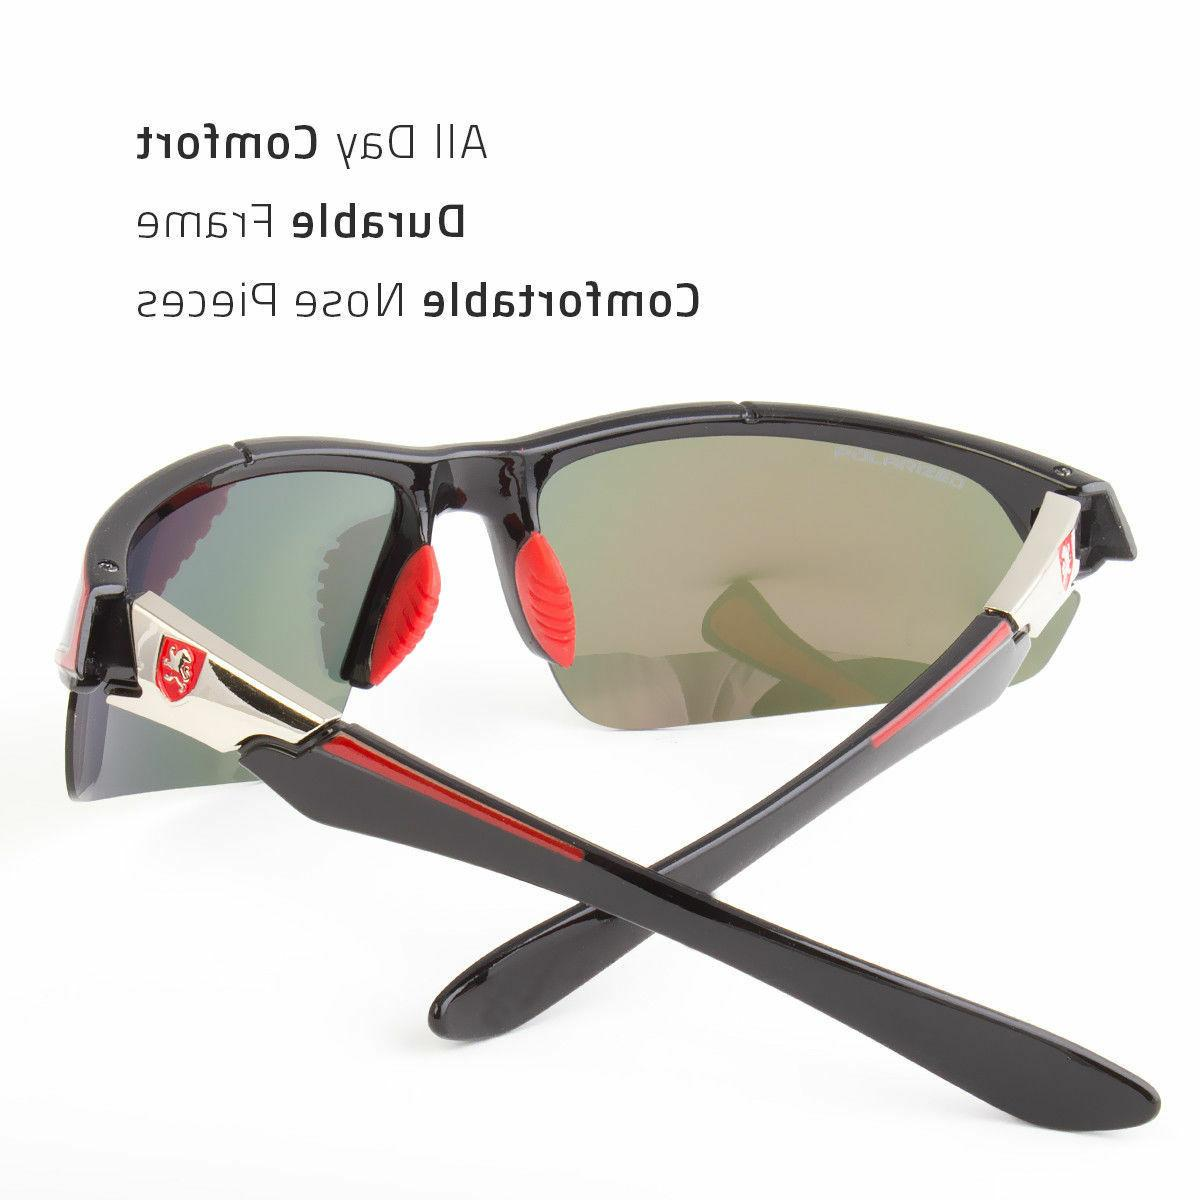 2 Men Sunglasses Wrap Mirror Driving Eyewear